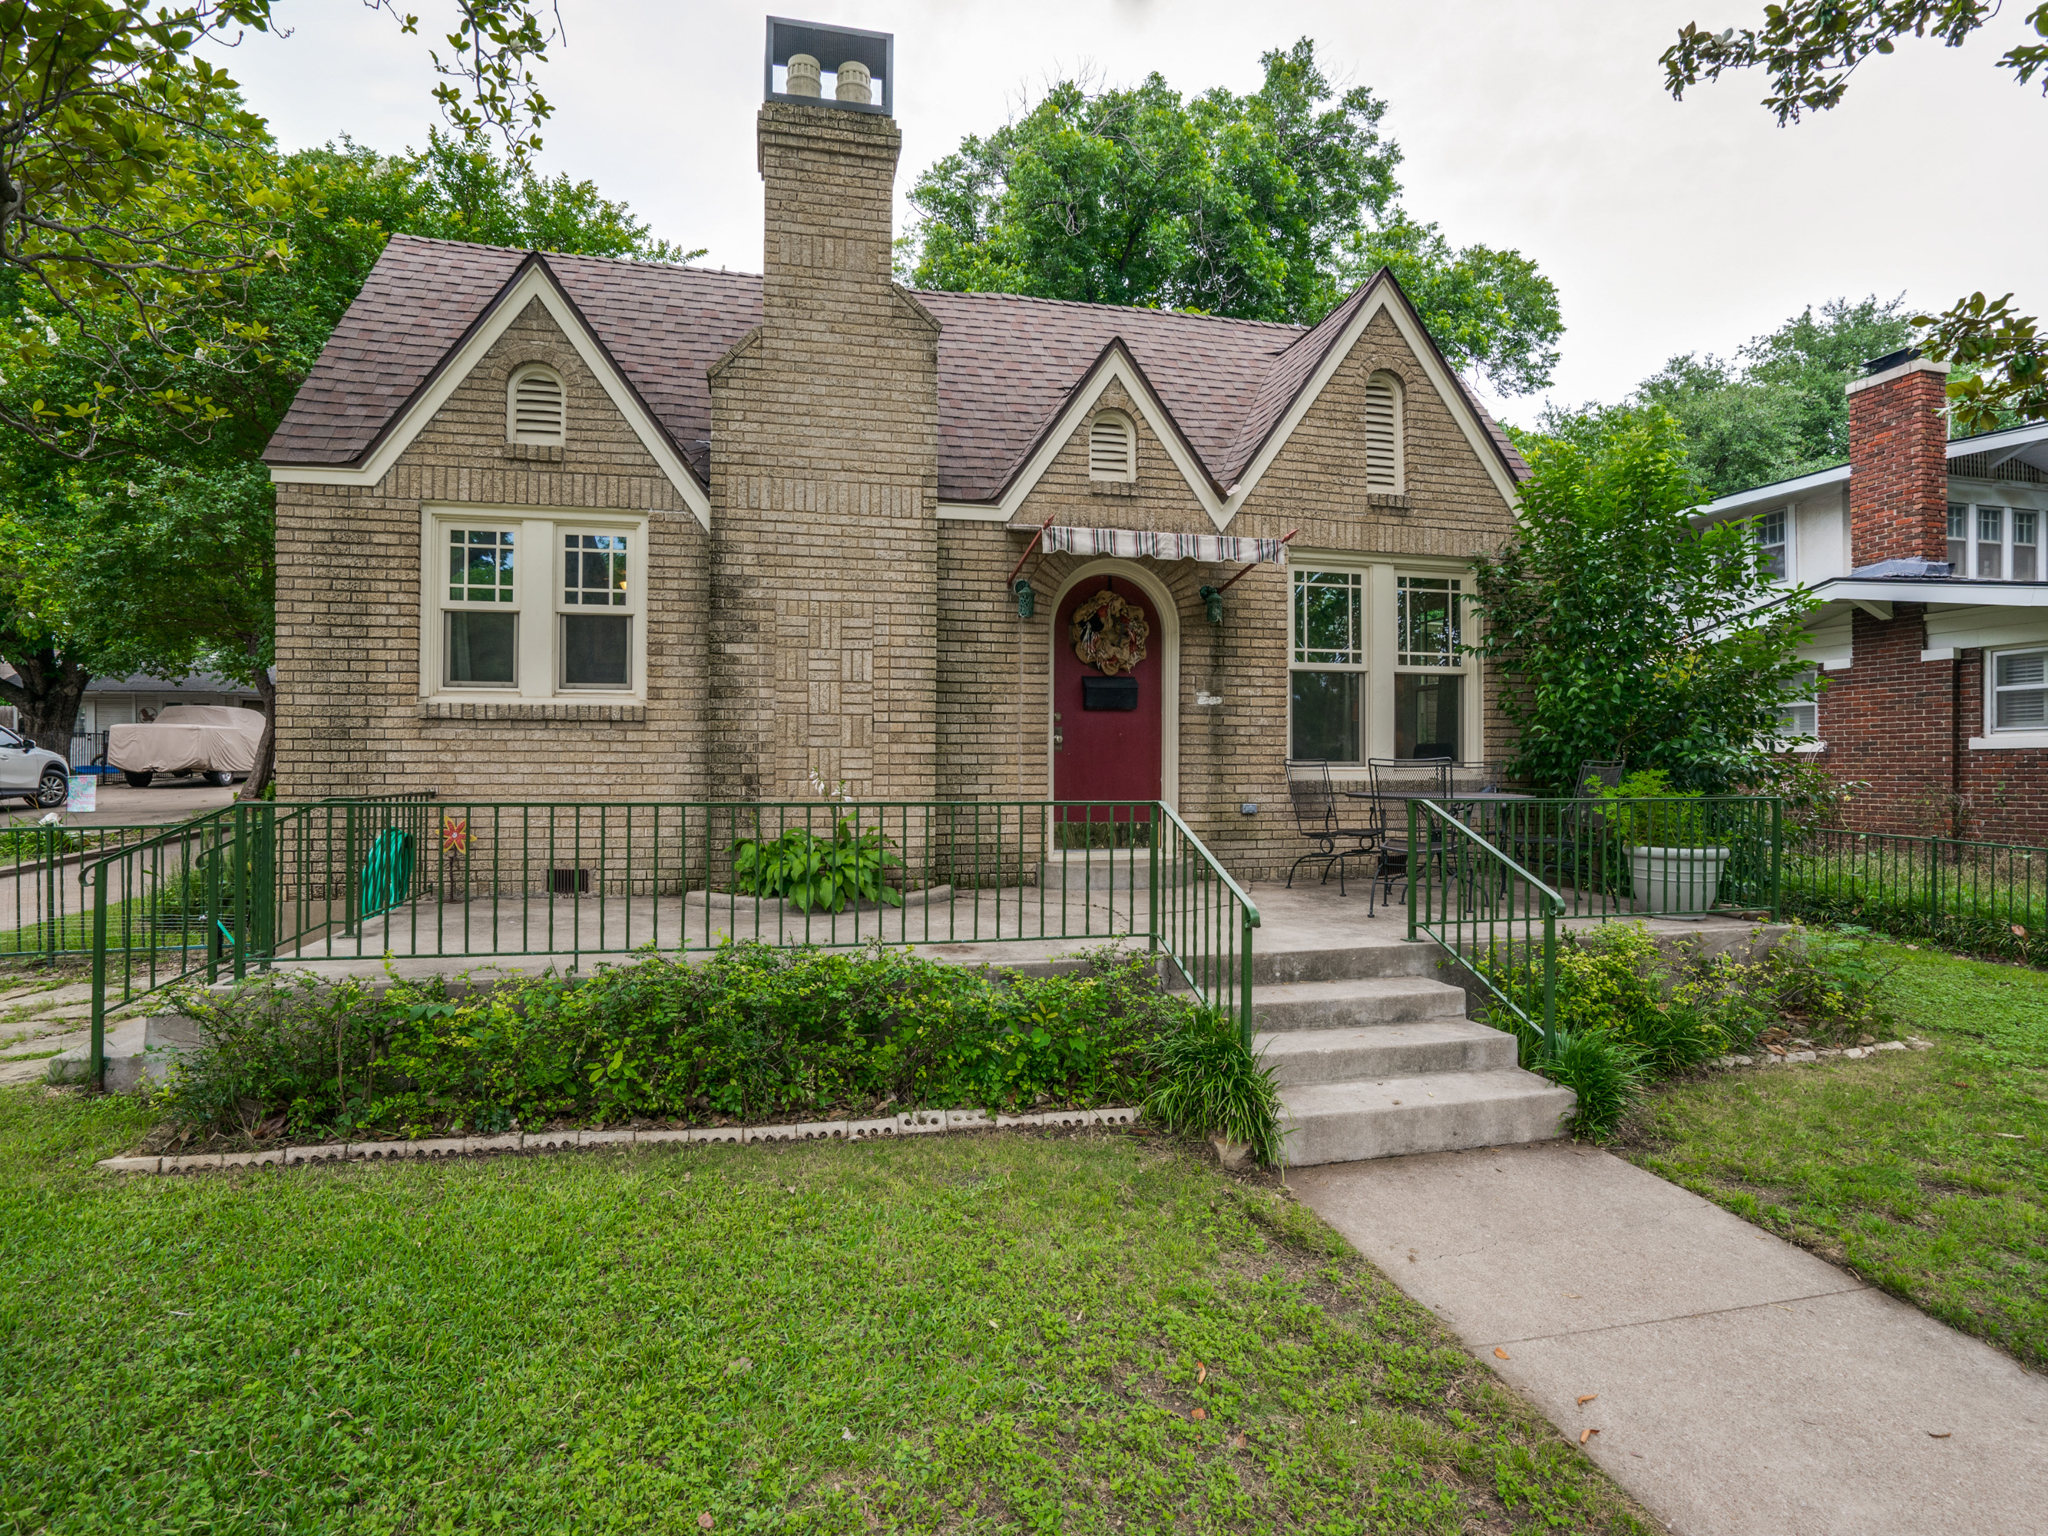 Nhà ở một gia đình vì Bán tại Quaint Cottage off of Camp Bowie Near Culture District 1222 Virginia Place Fort Worth, Texas, 76107 Hoa Kỳ